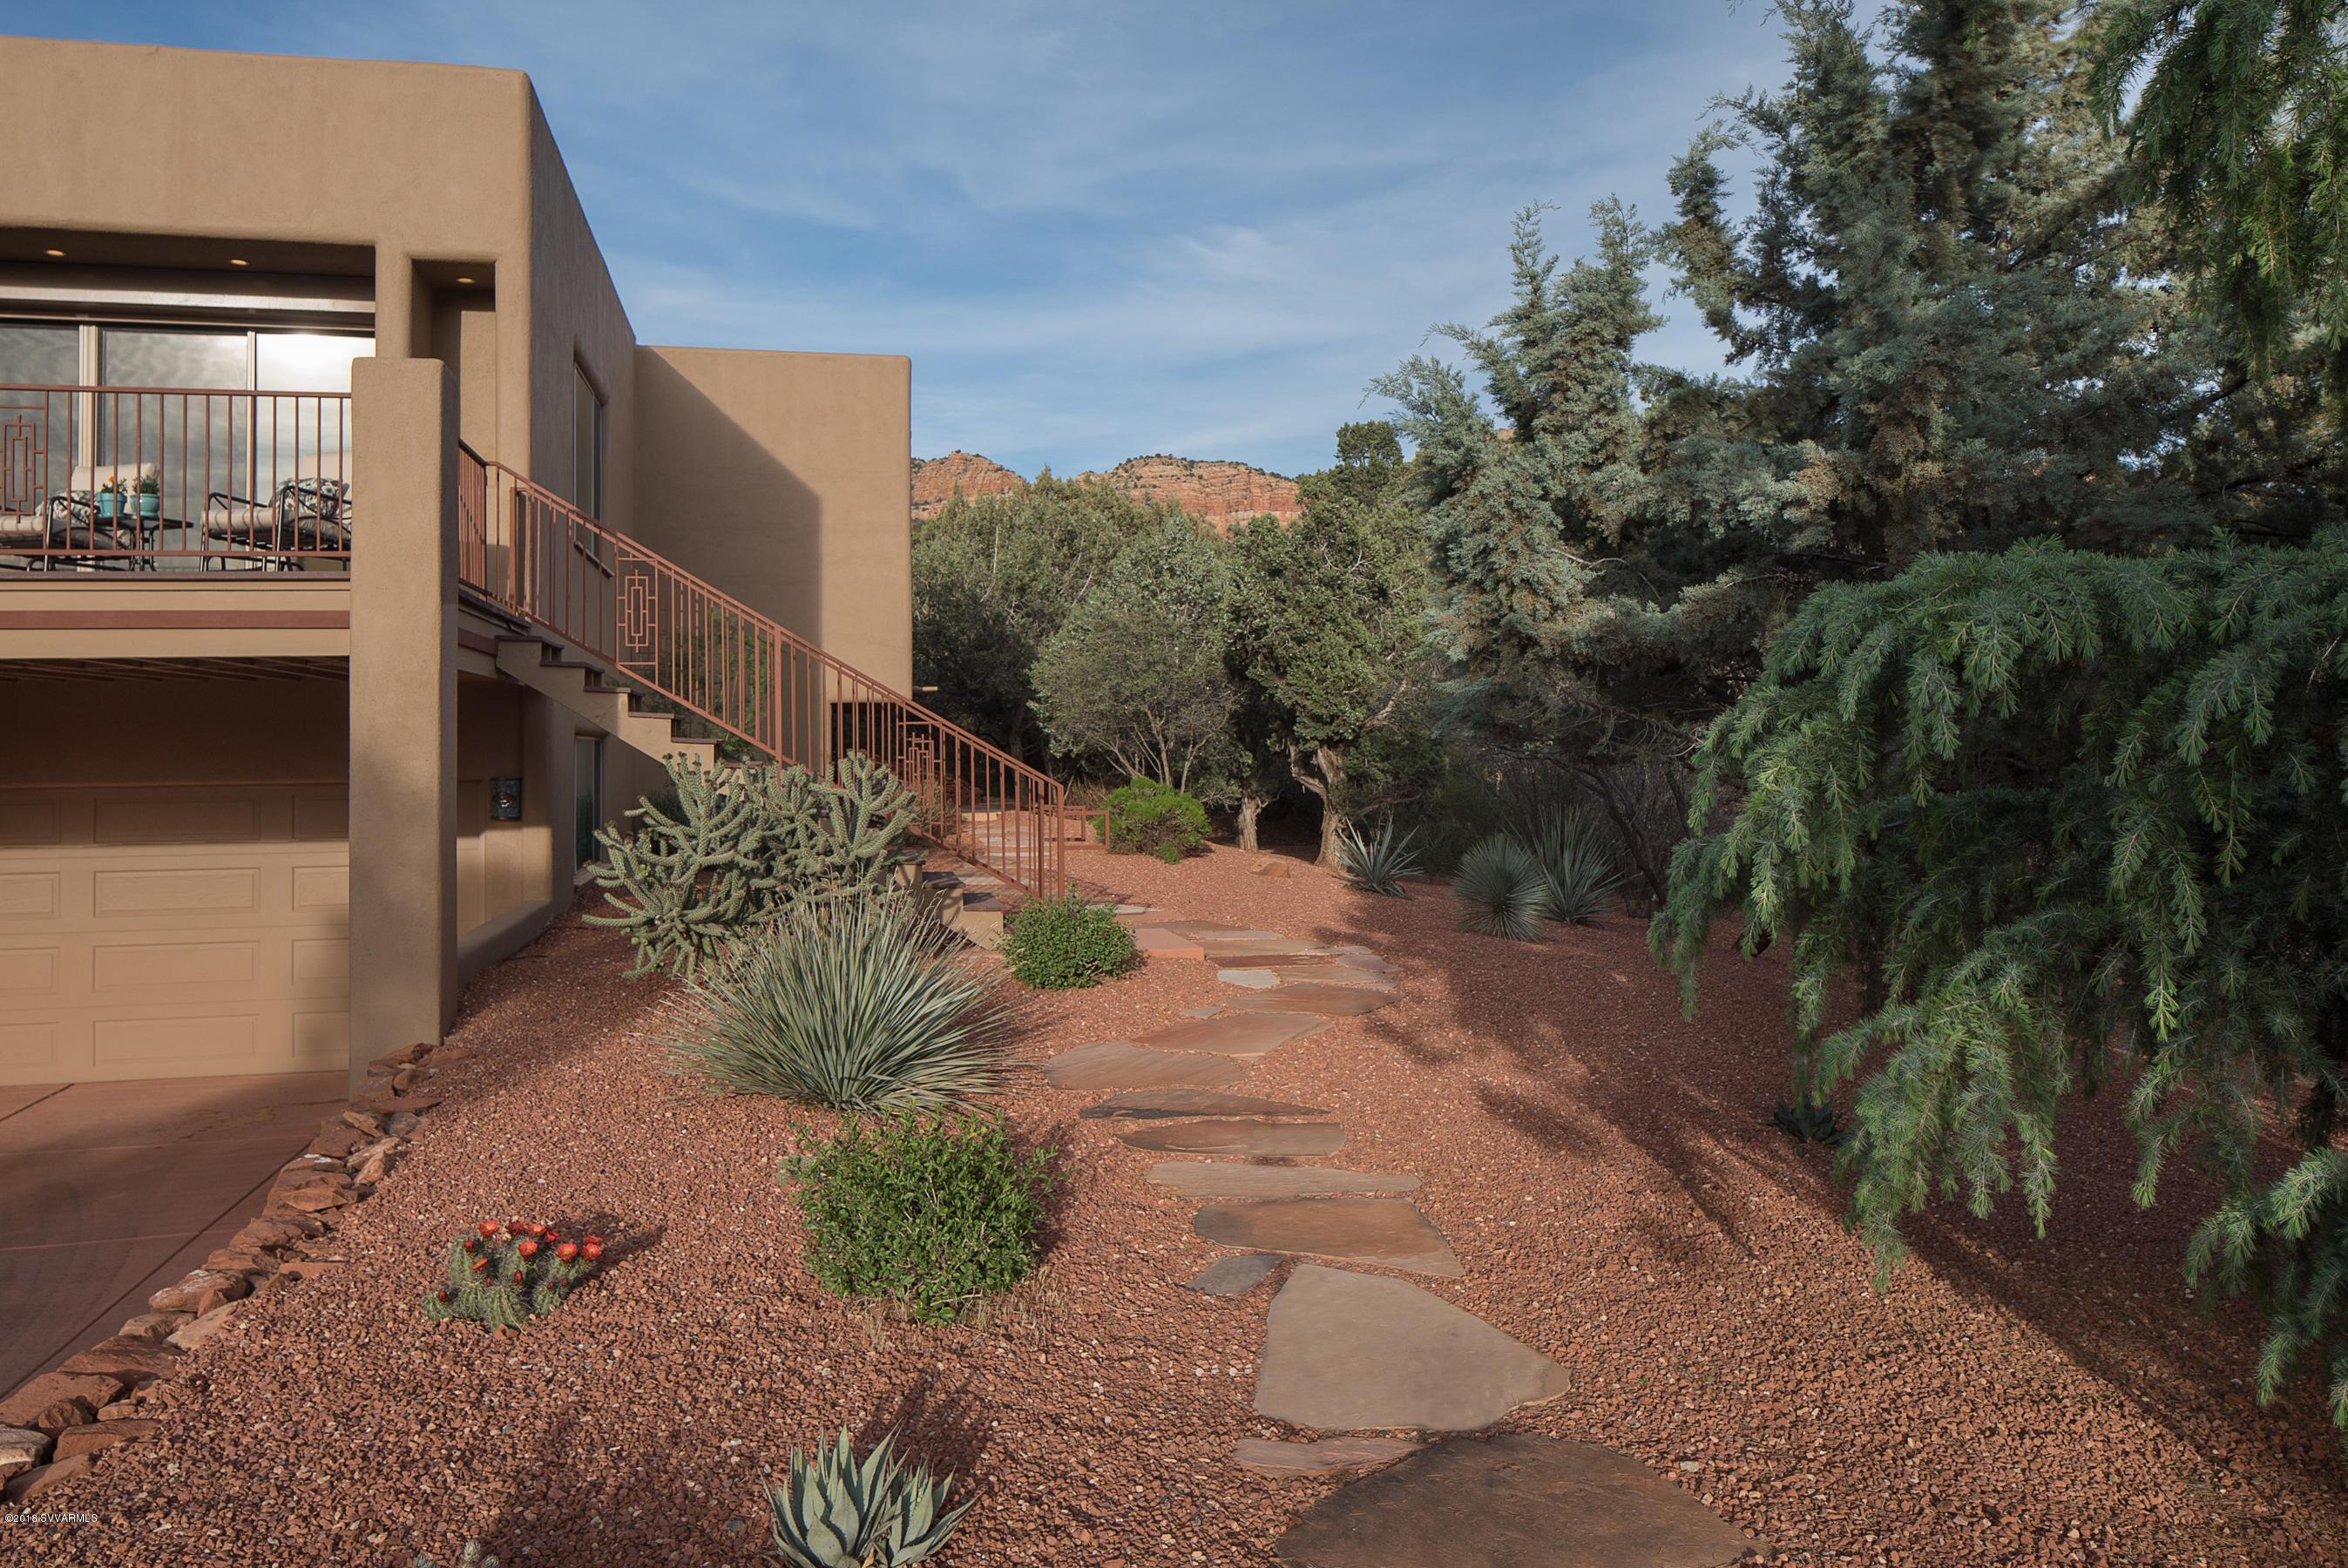 35 Beaver Lane Sedona, AZ 86351